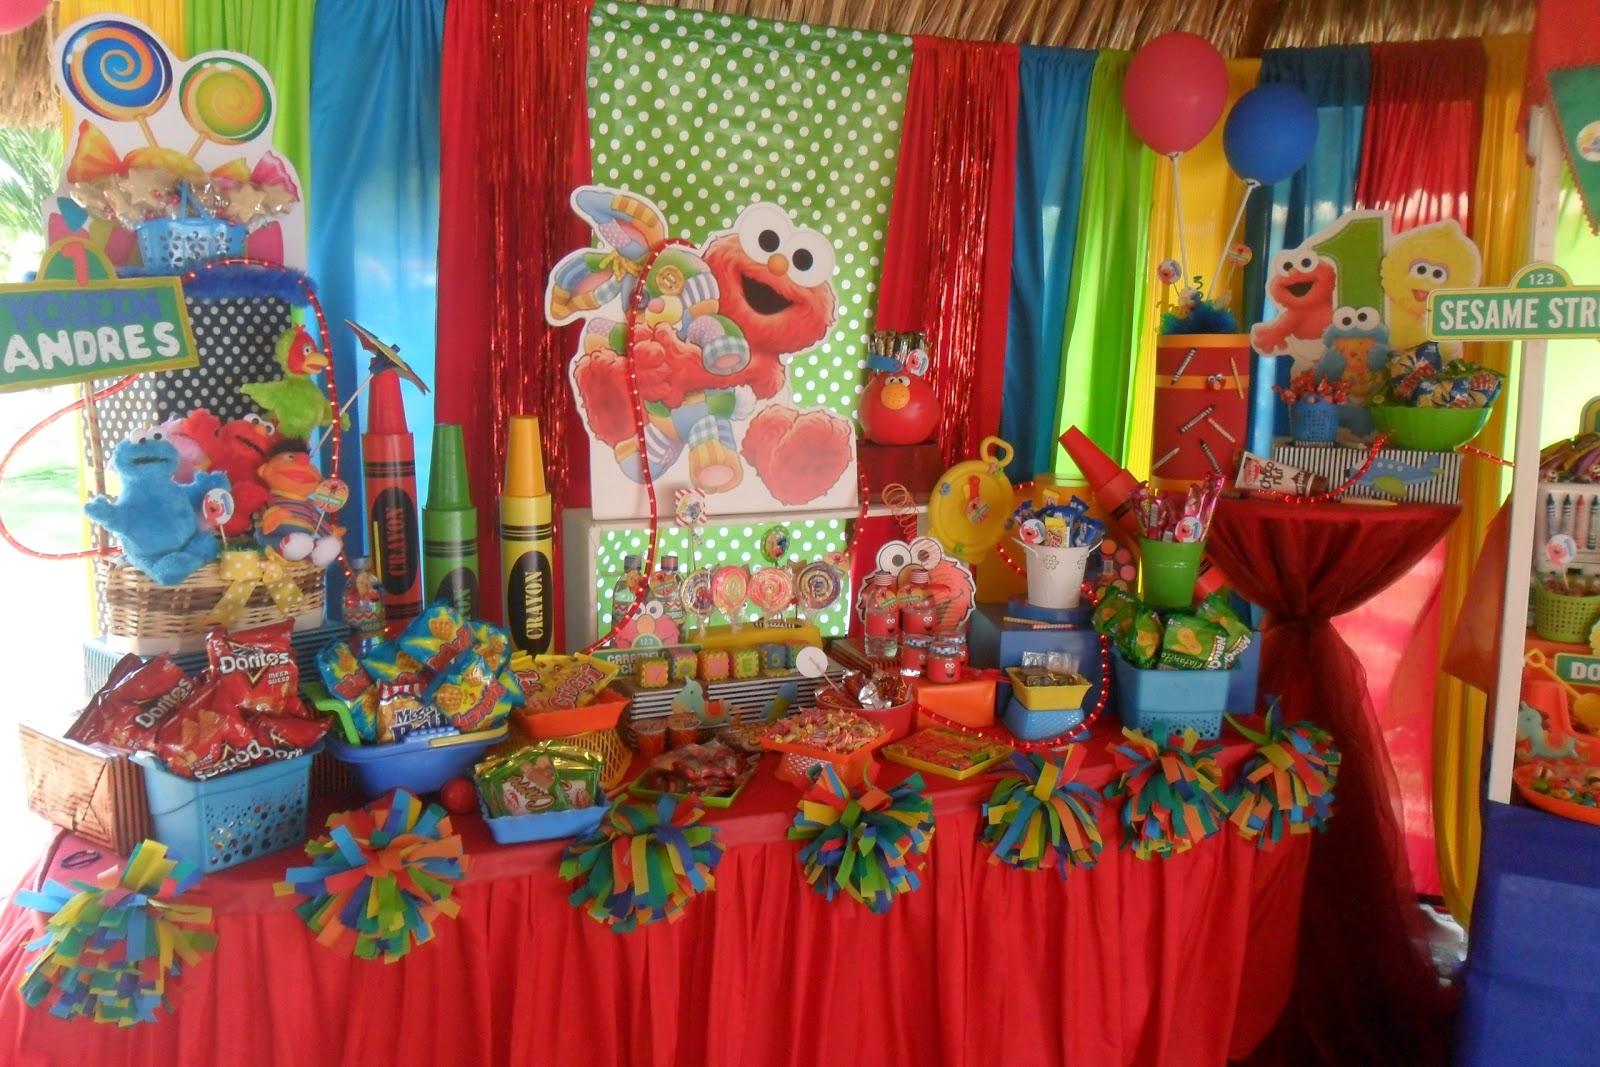 Ursula newman eventos decoraci n de fiesta plaza sesamo - Decoracion fiestas bebes ...